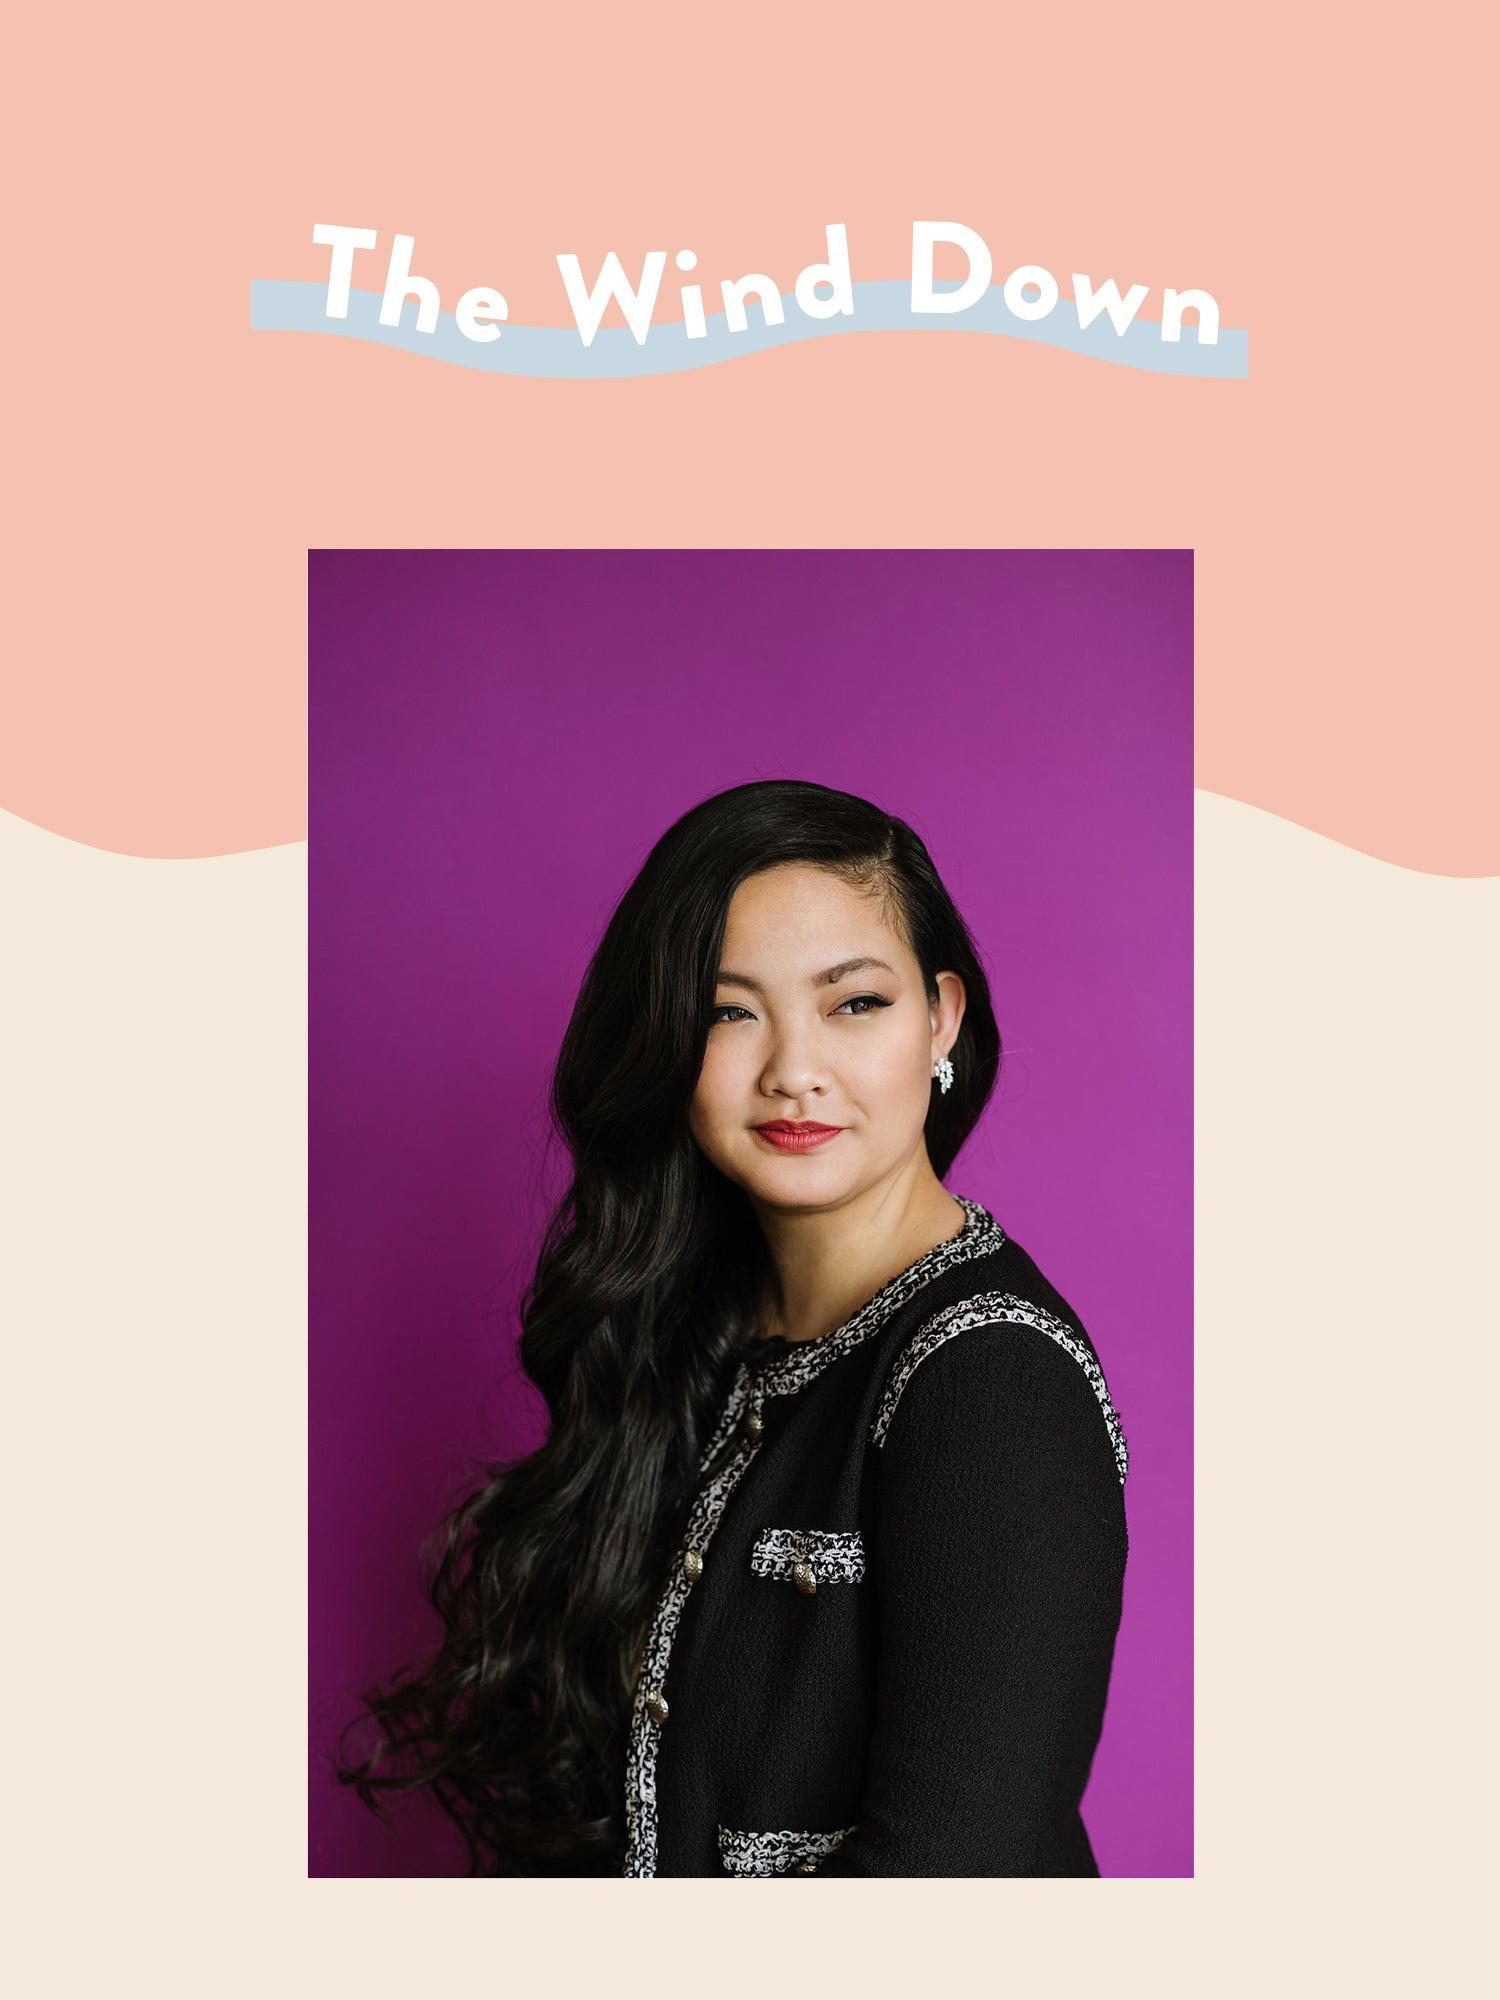 Amanda Nguyen's Nighttime Routine Starts With Gratitude